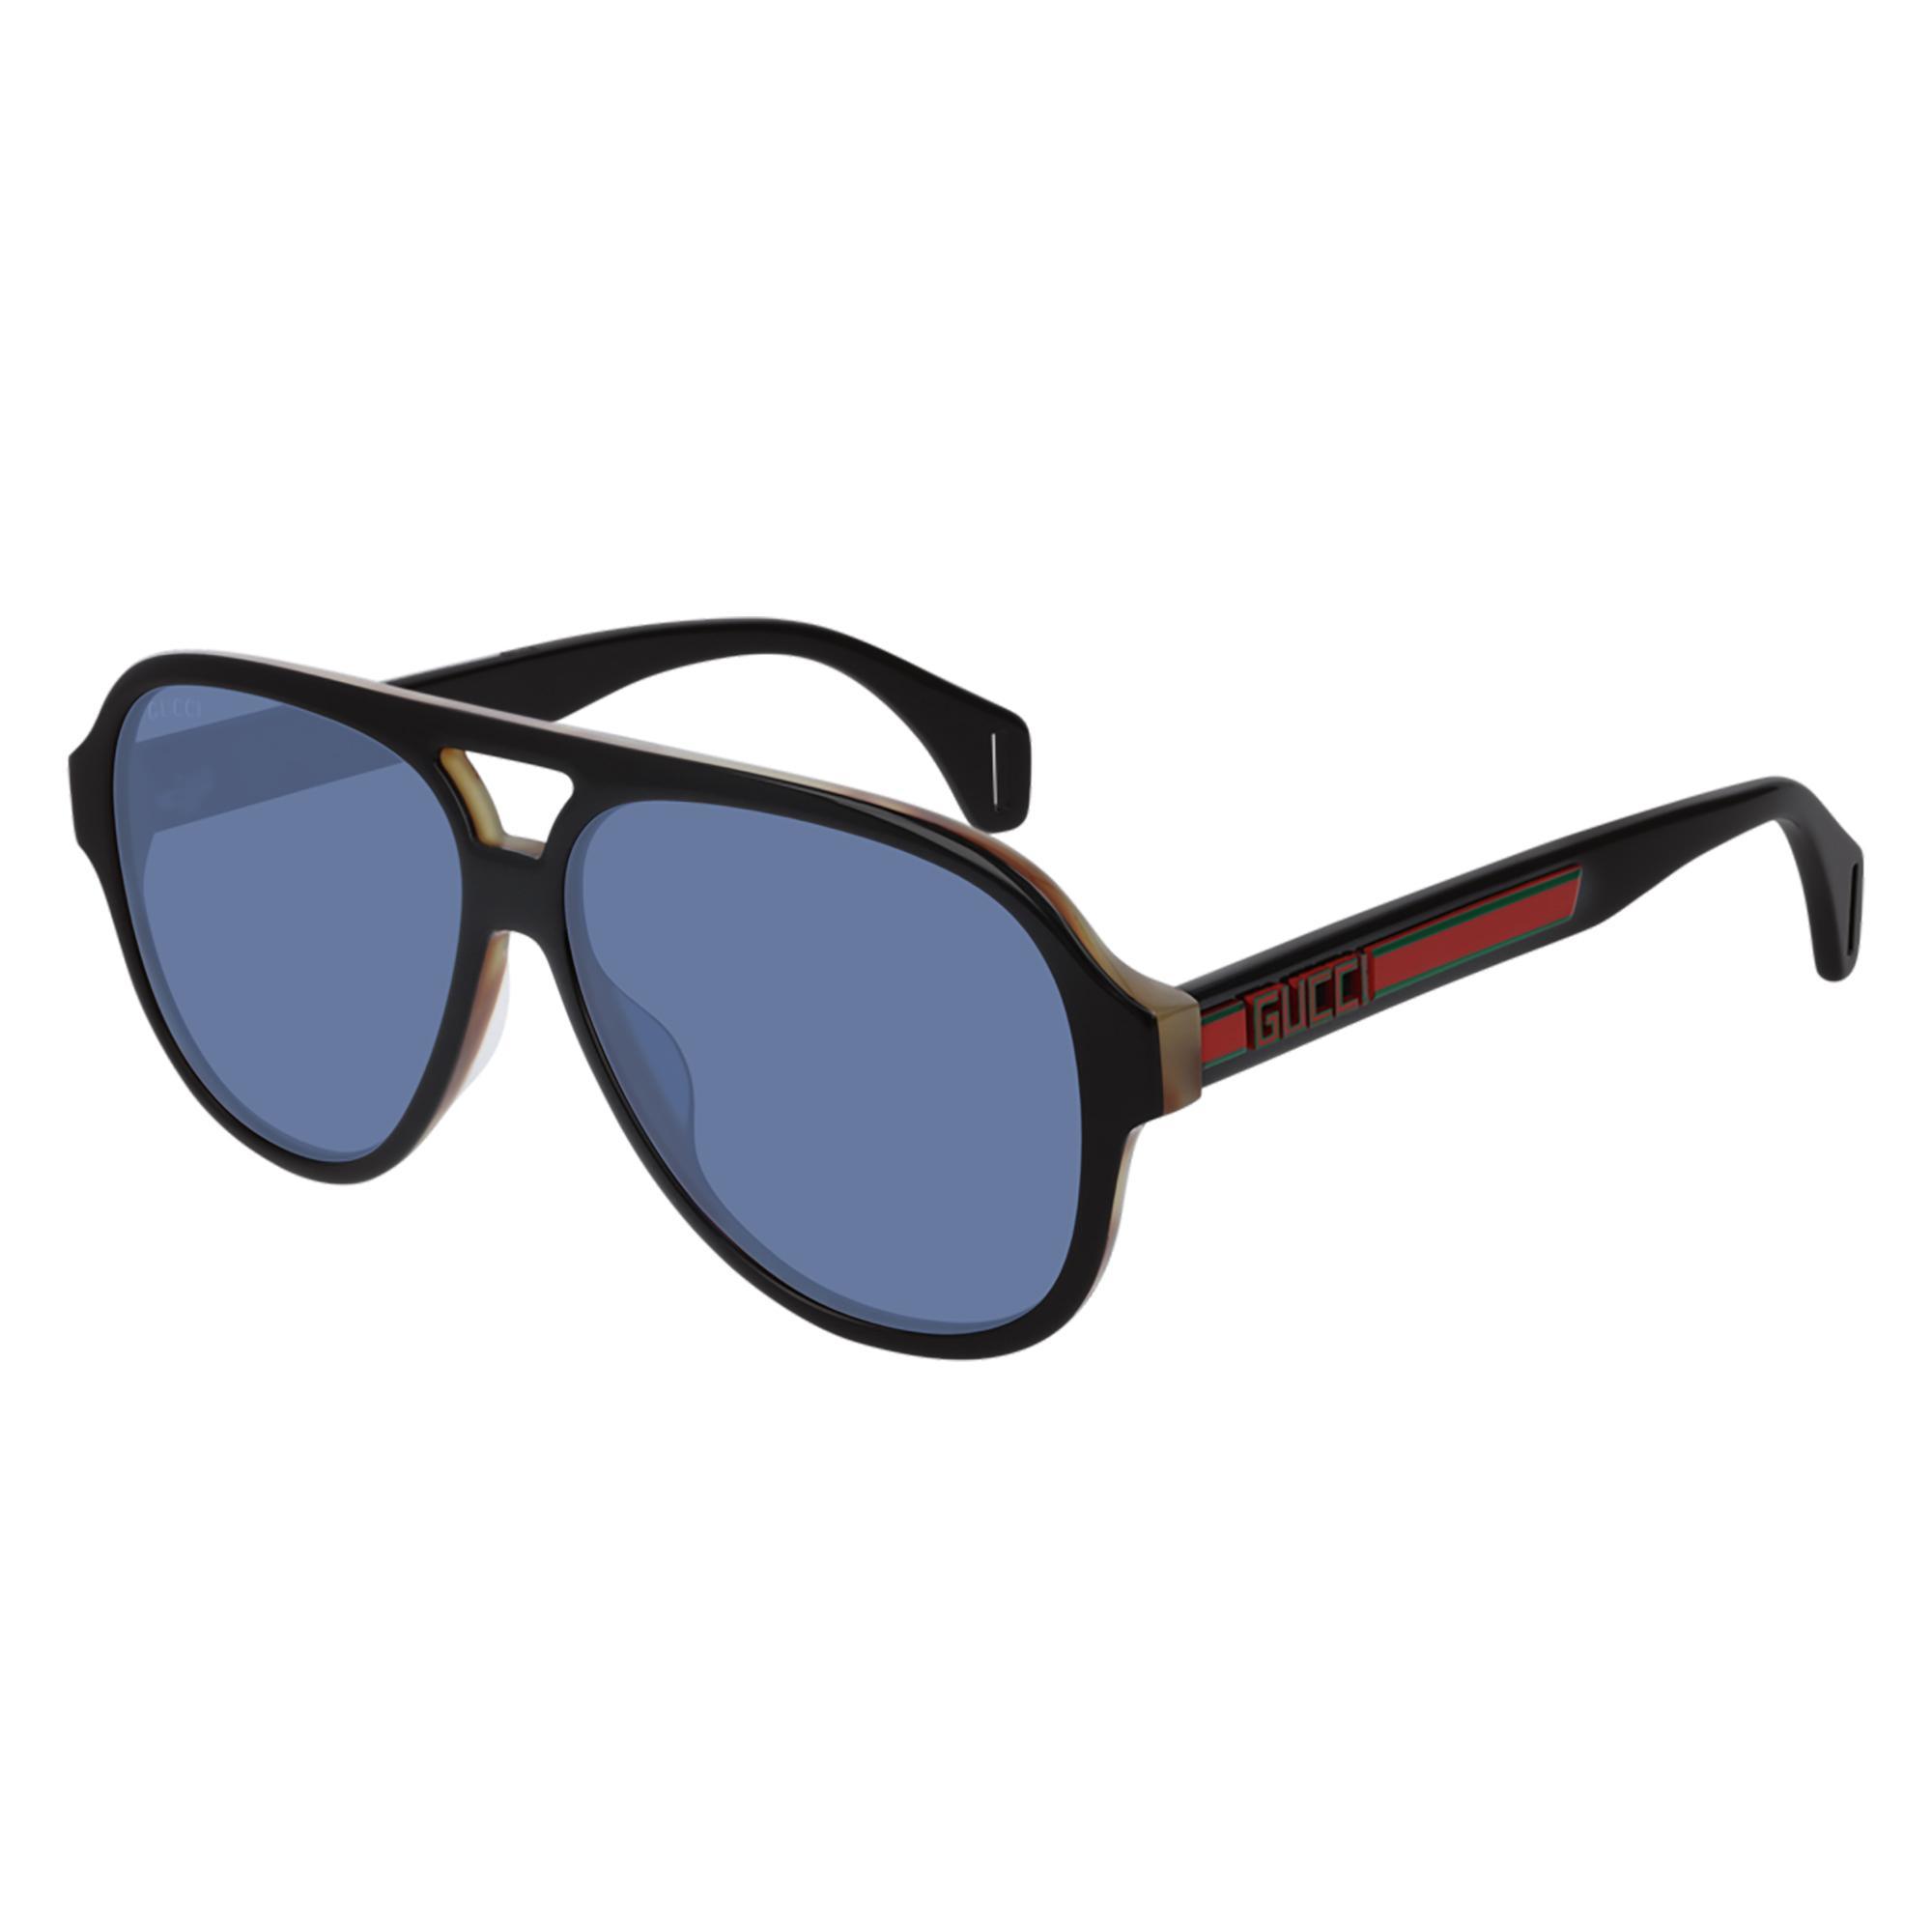 004 black black blue